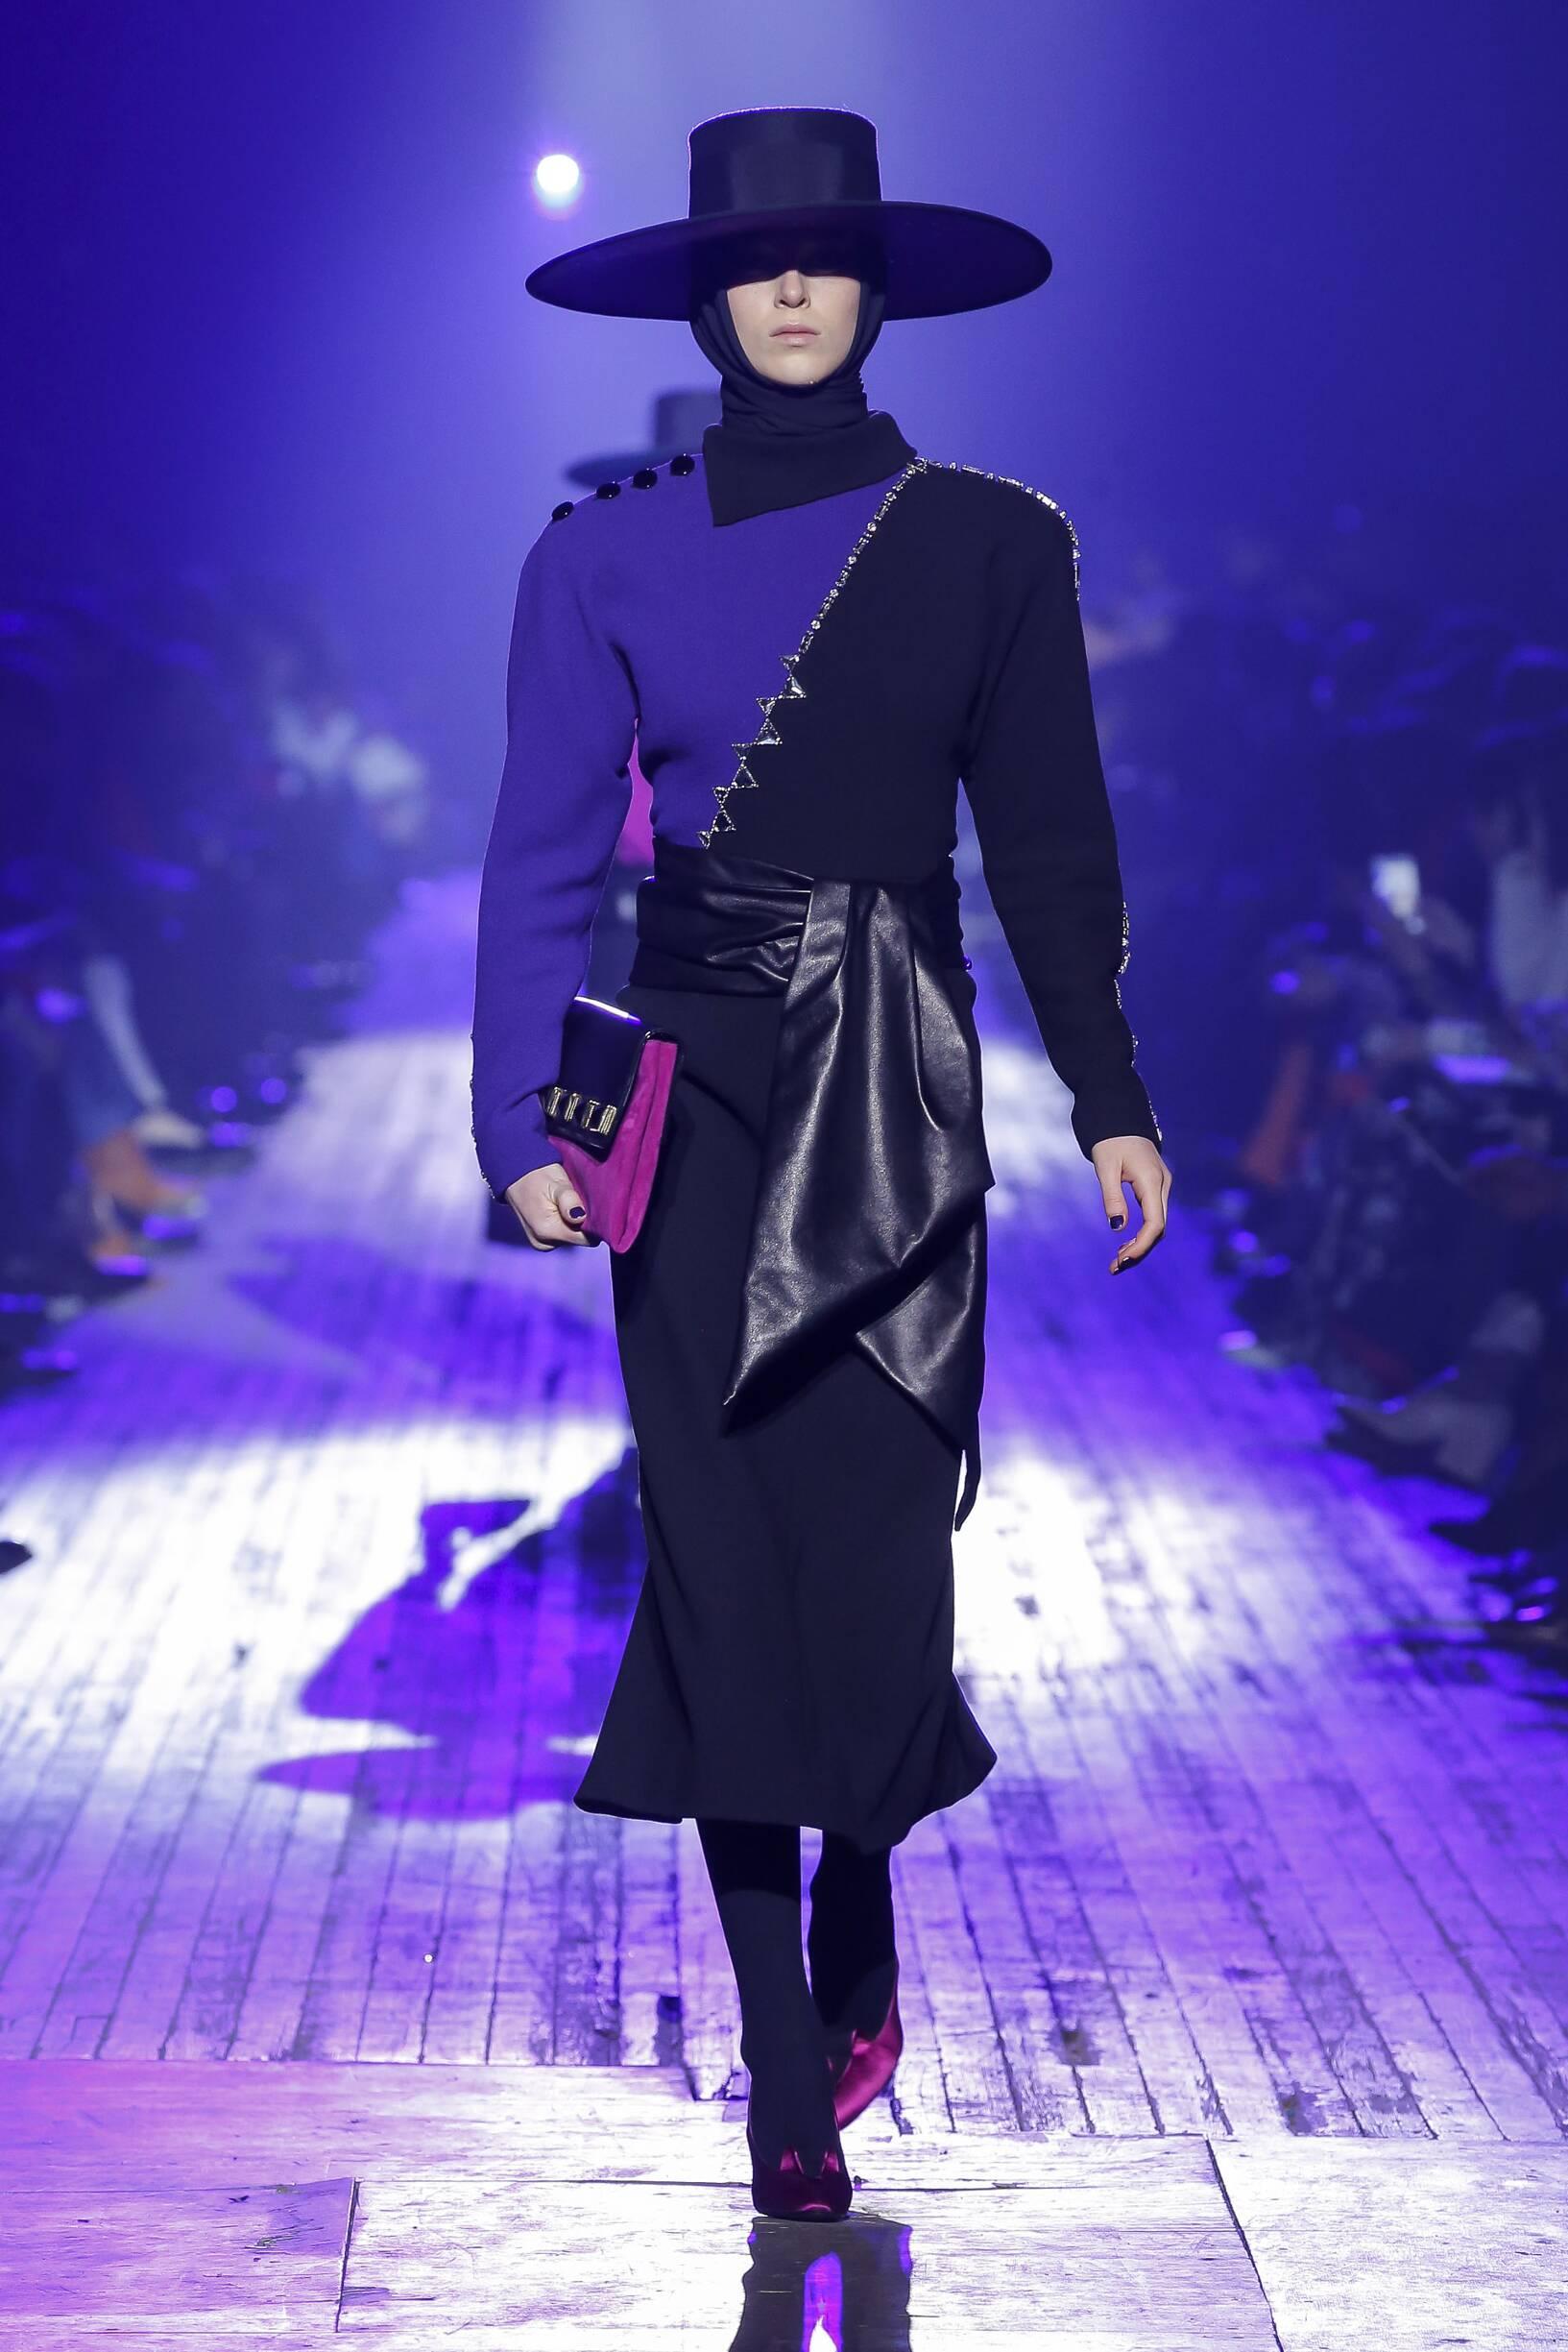 Marc Jacobs Winter 2018 Woman Catwalk